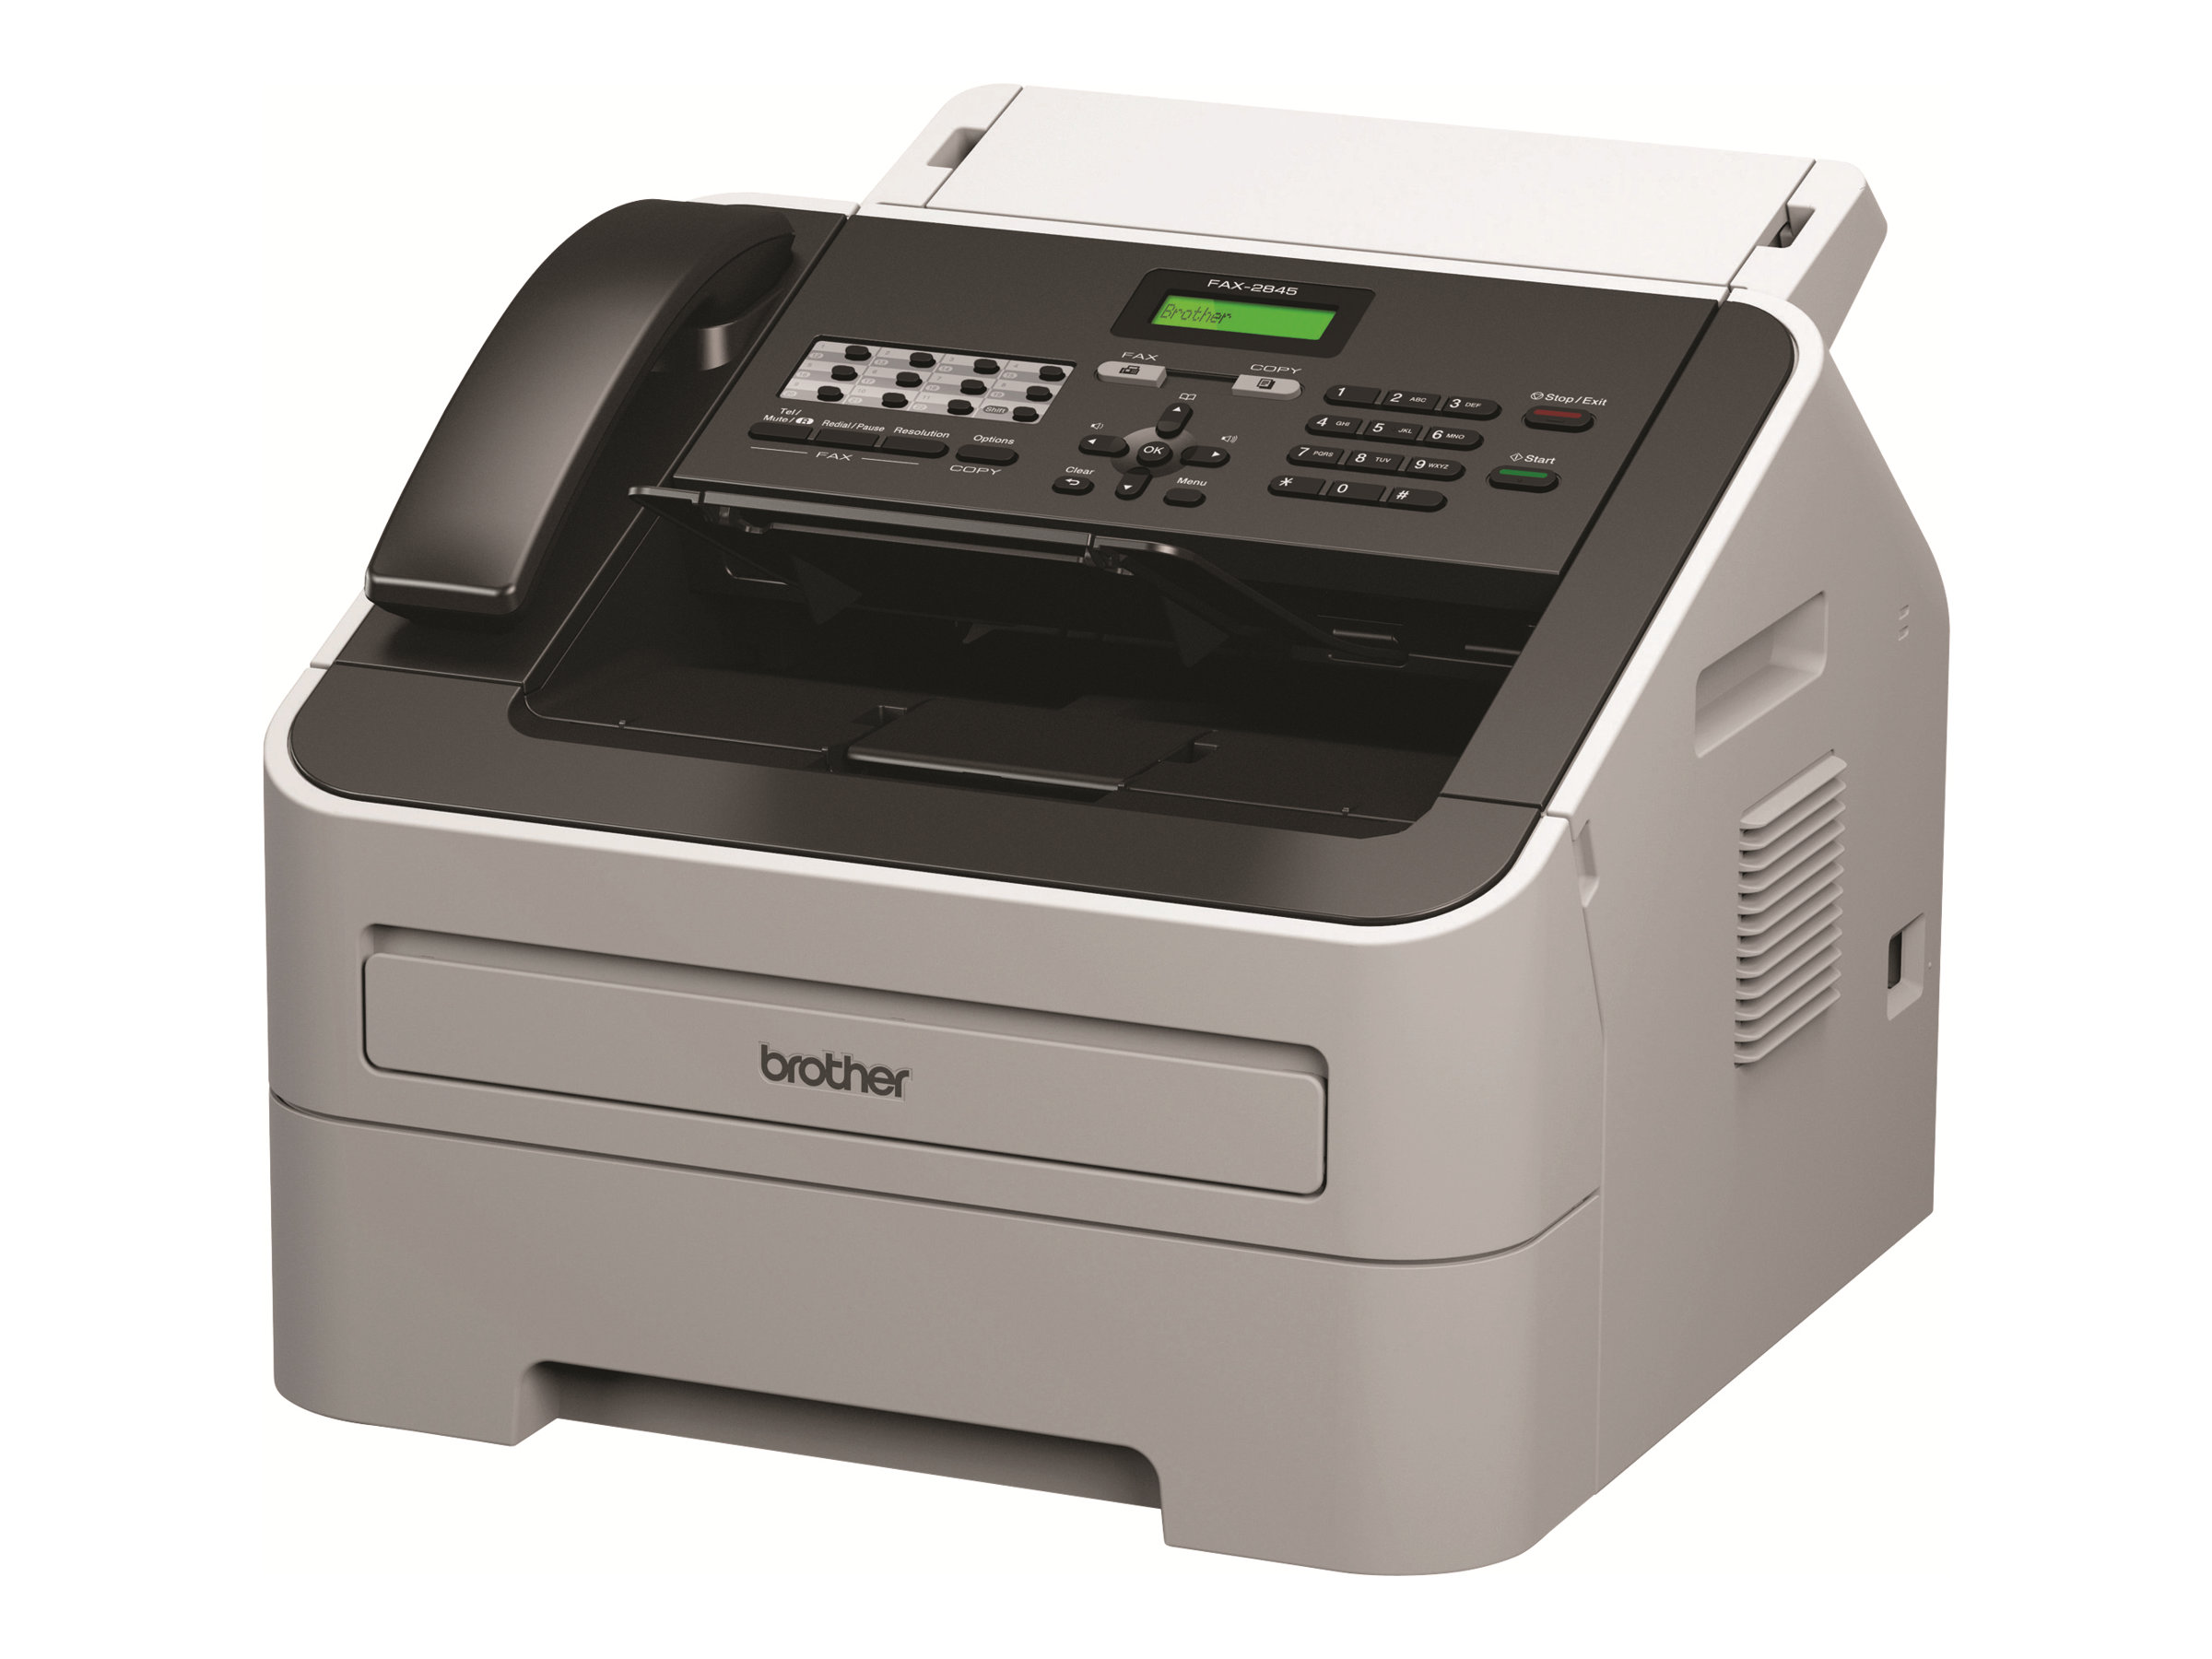 Brother FAX-2845 - Faxgerät / Kopierer - s/w - Laser - 216 x 406.4 mm (Medien) - 250 Blatt